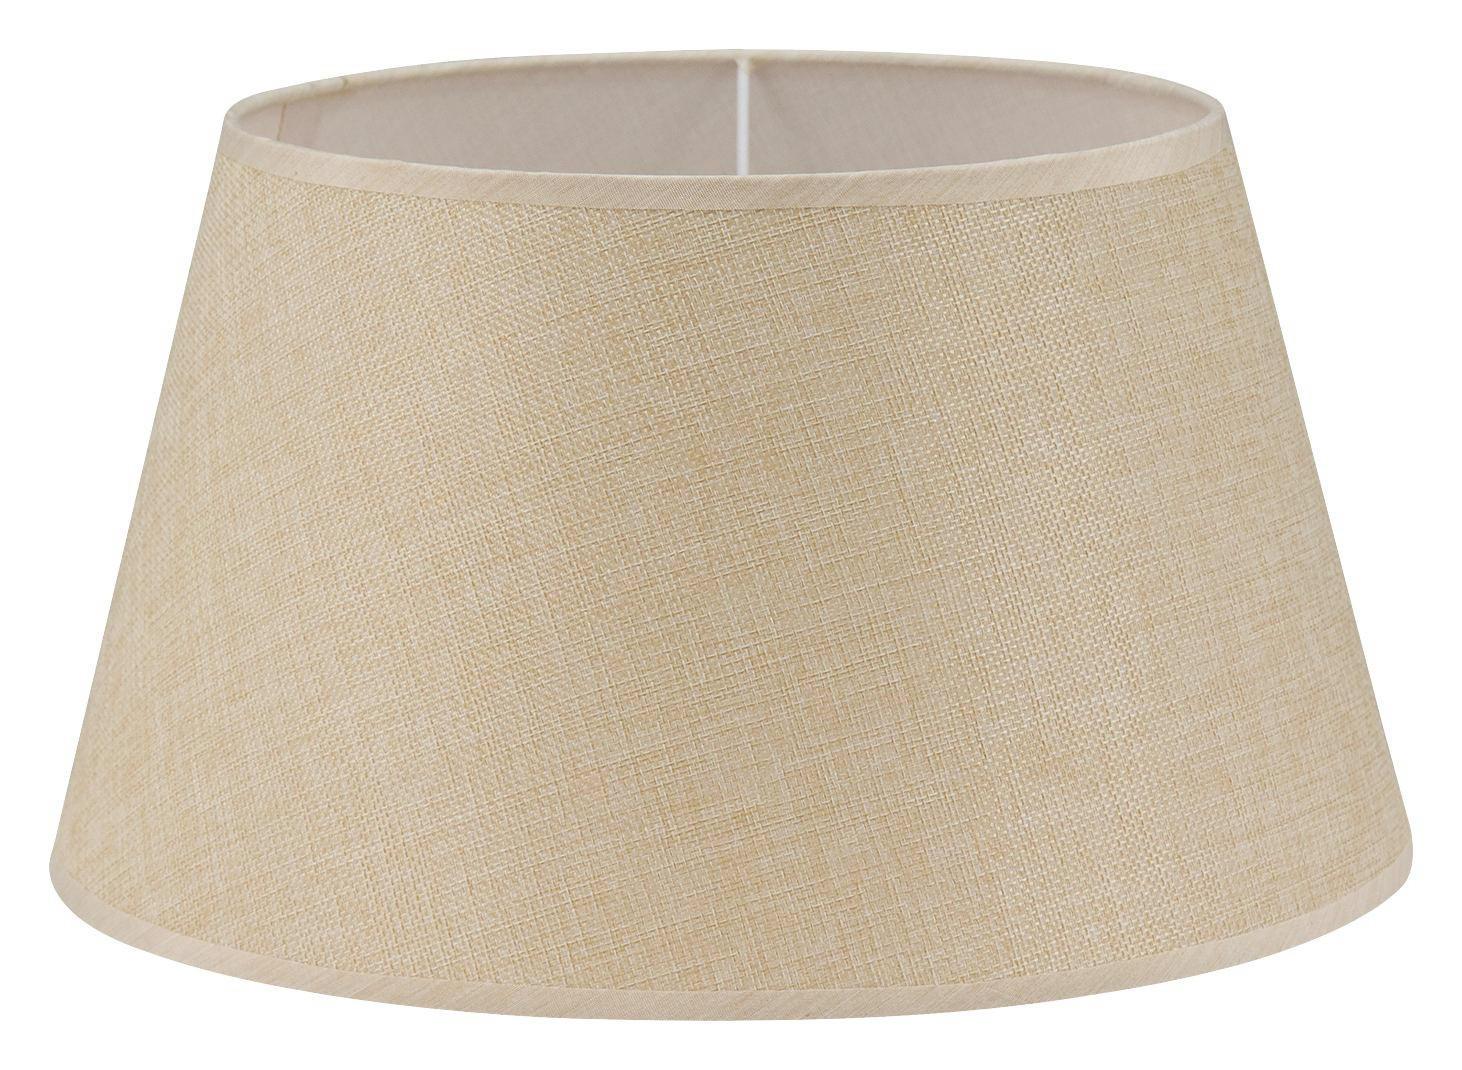 LEUCHTENSCHIRM  Creme  Textil  E27 - Creme, Design, Textil (35/19cm) - MARAMA